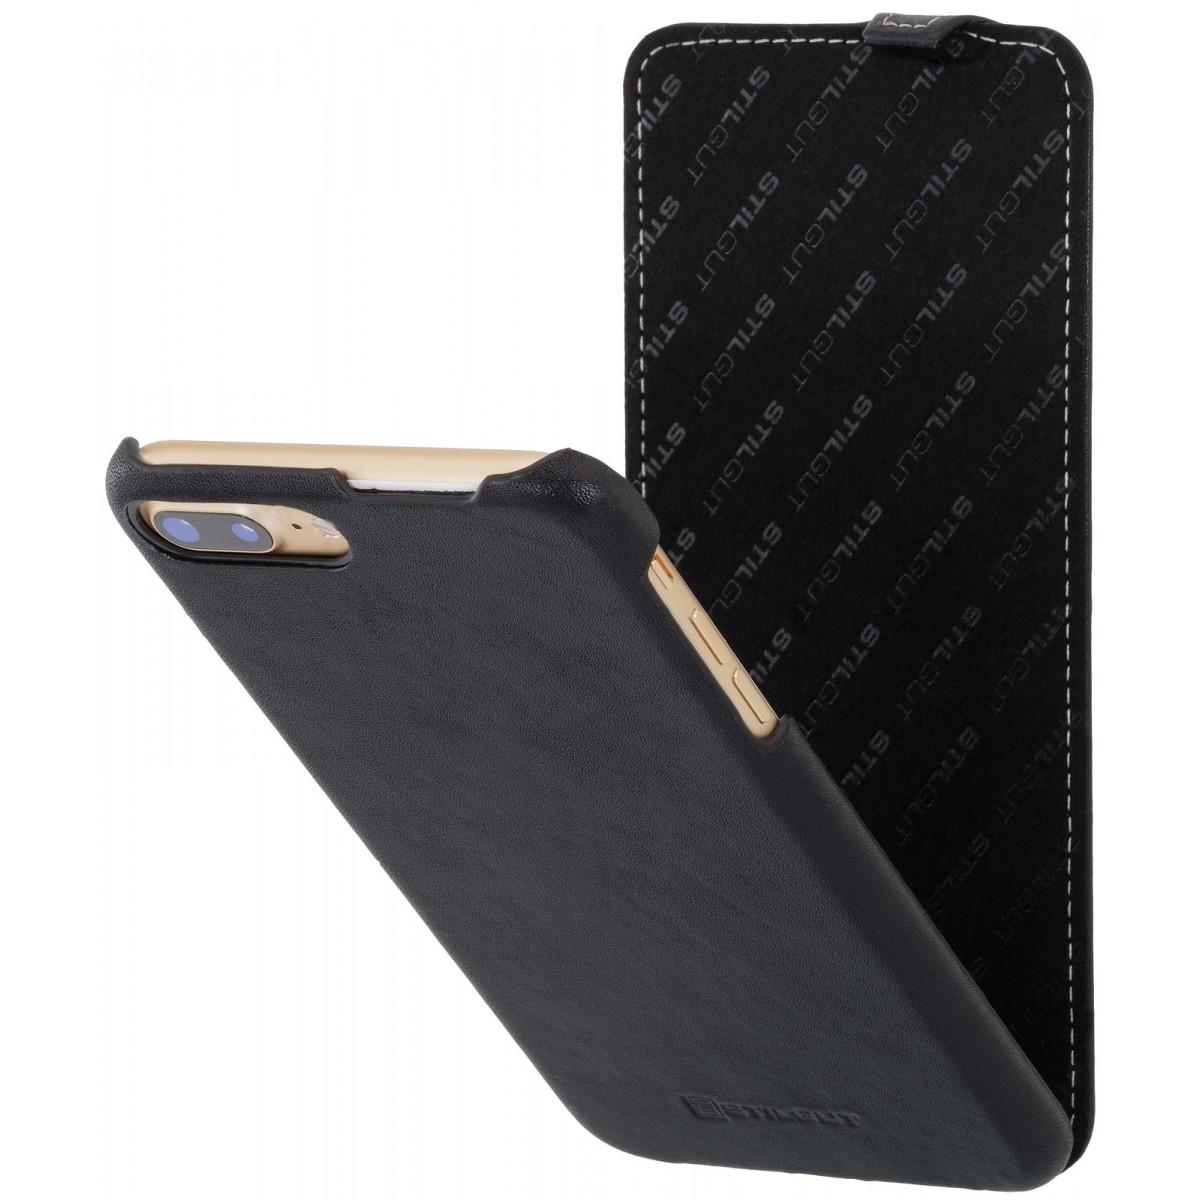 Etui iPhone 7 Plus nappa ultraslim noir nappa en cuir véritable - Stilgut